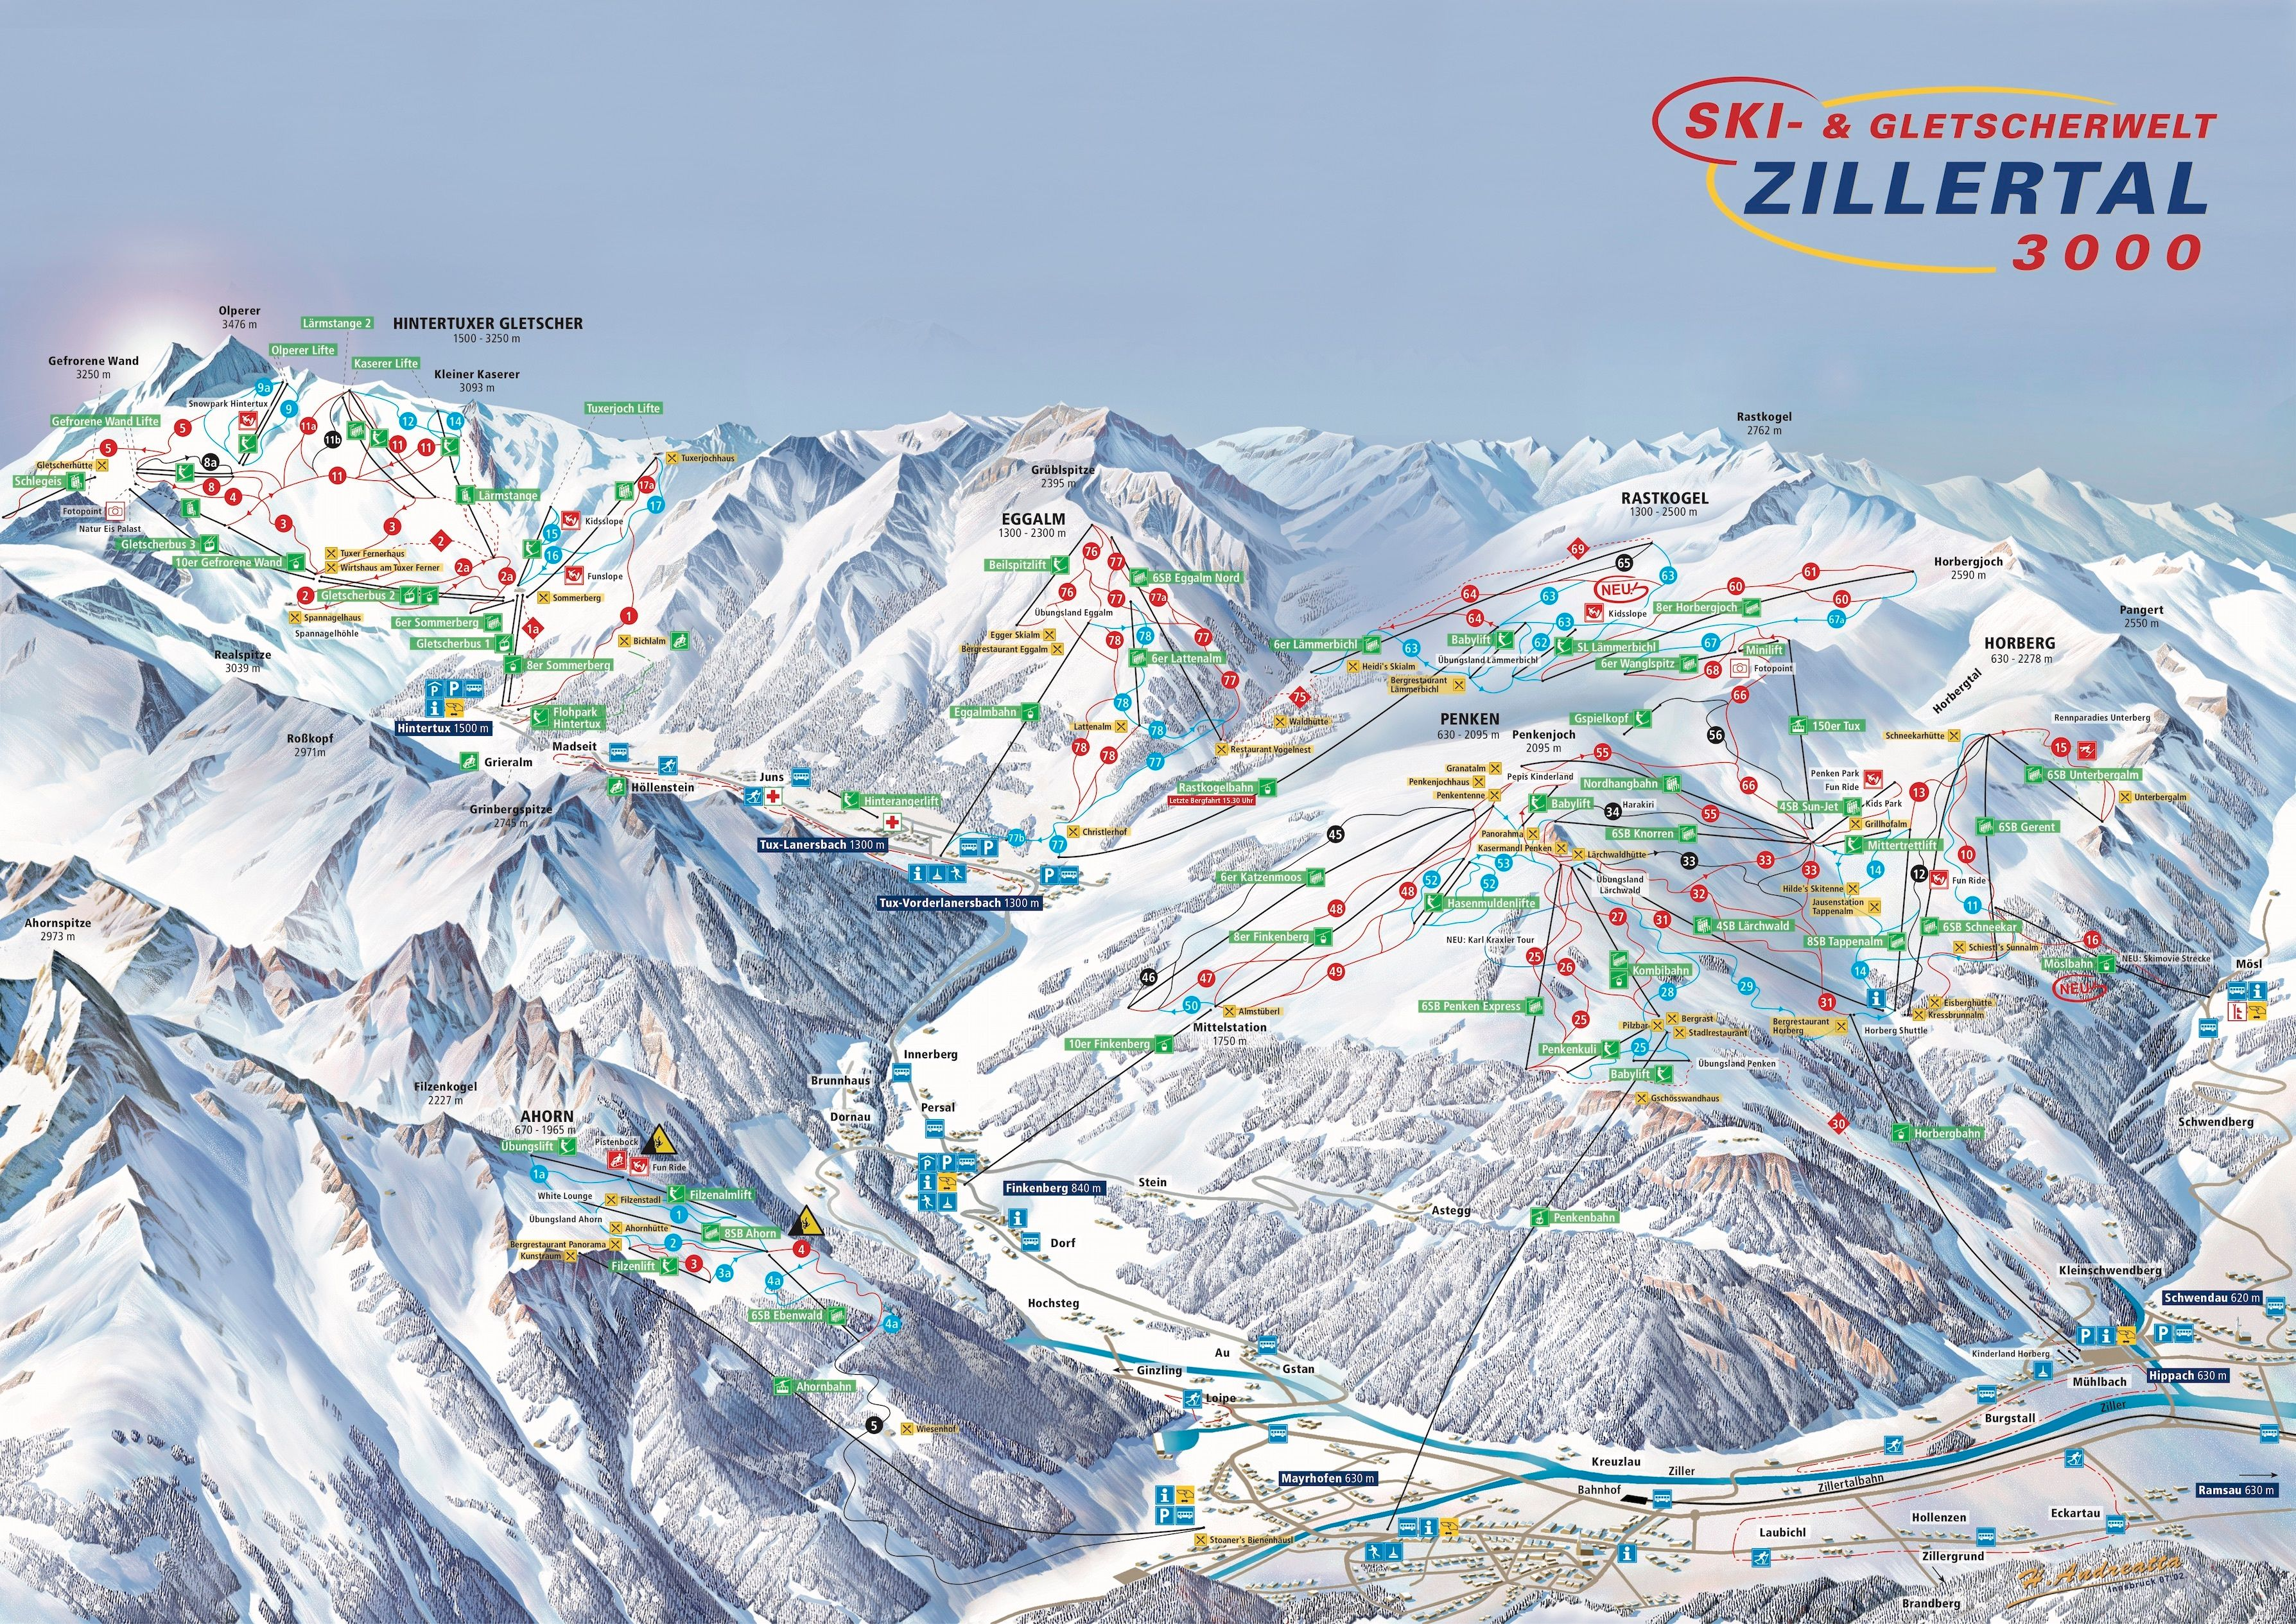 Zillertal 3000 (2018-2019)